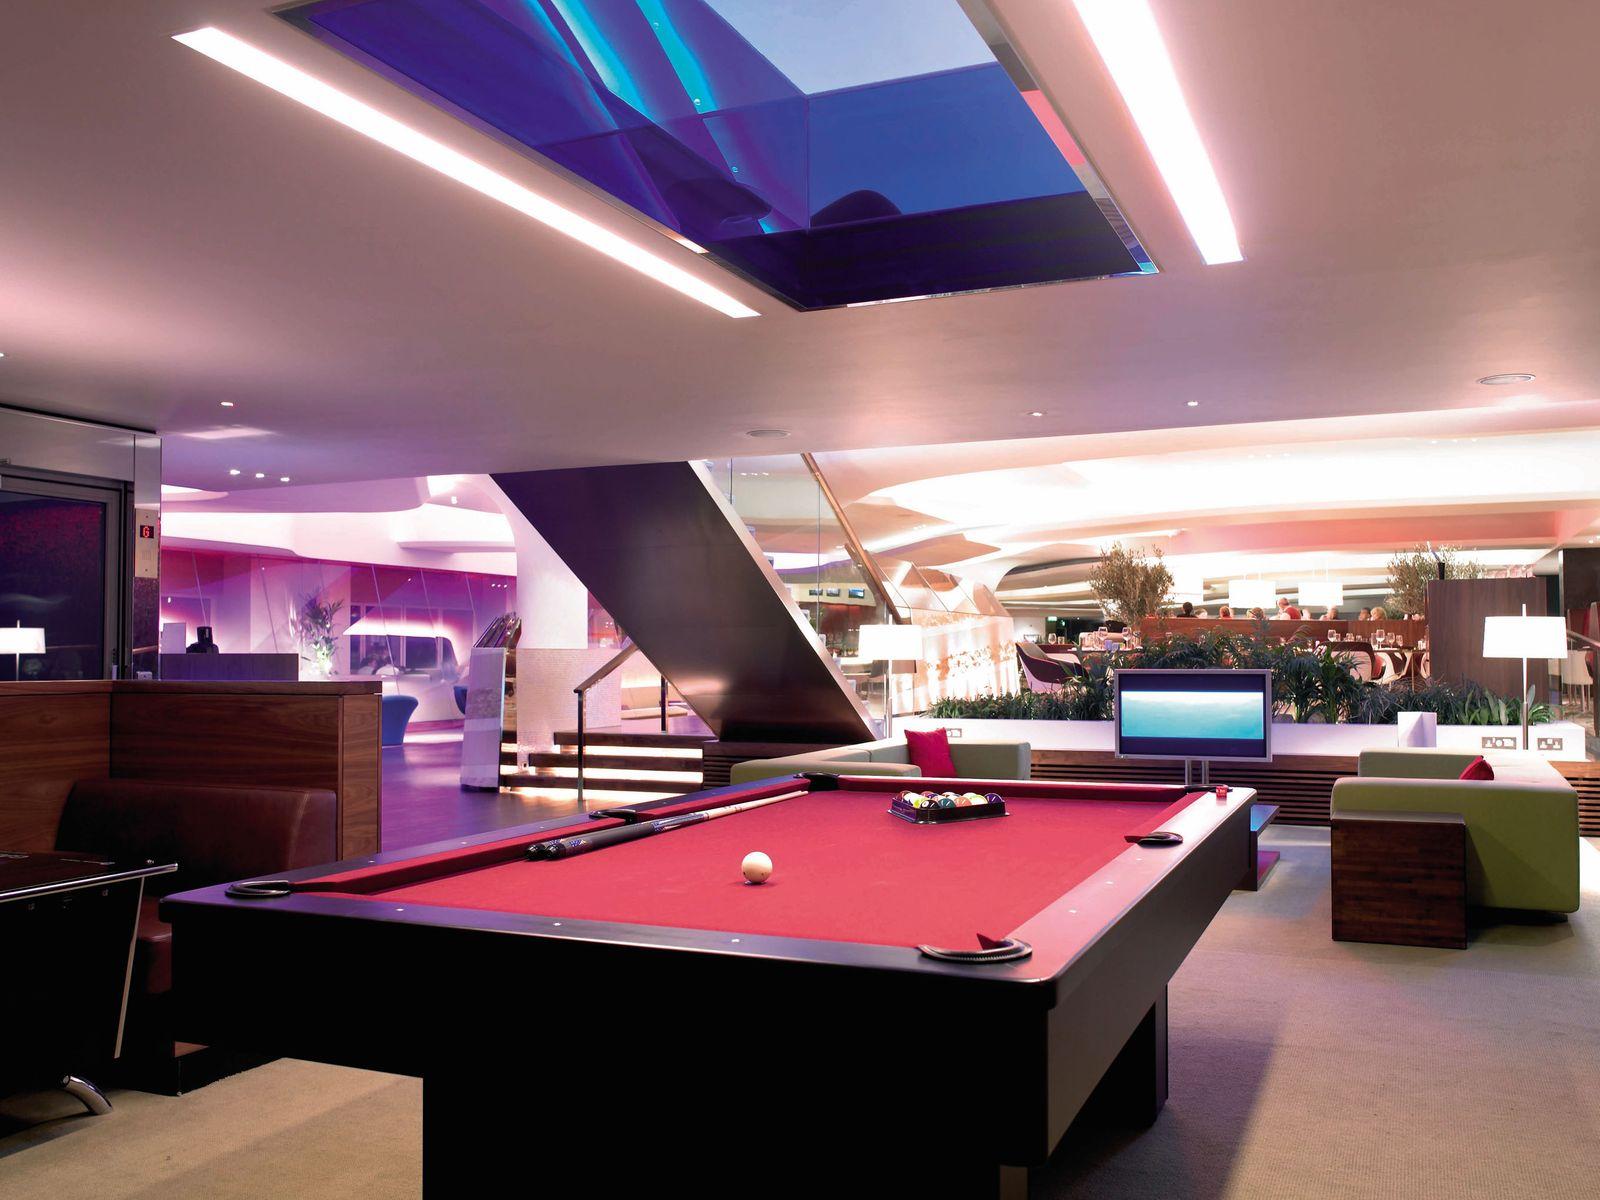 Virgin / Heathrow Atlantic Clubhouse